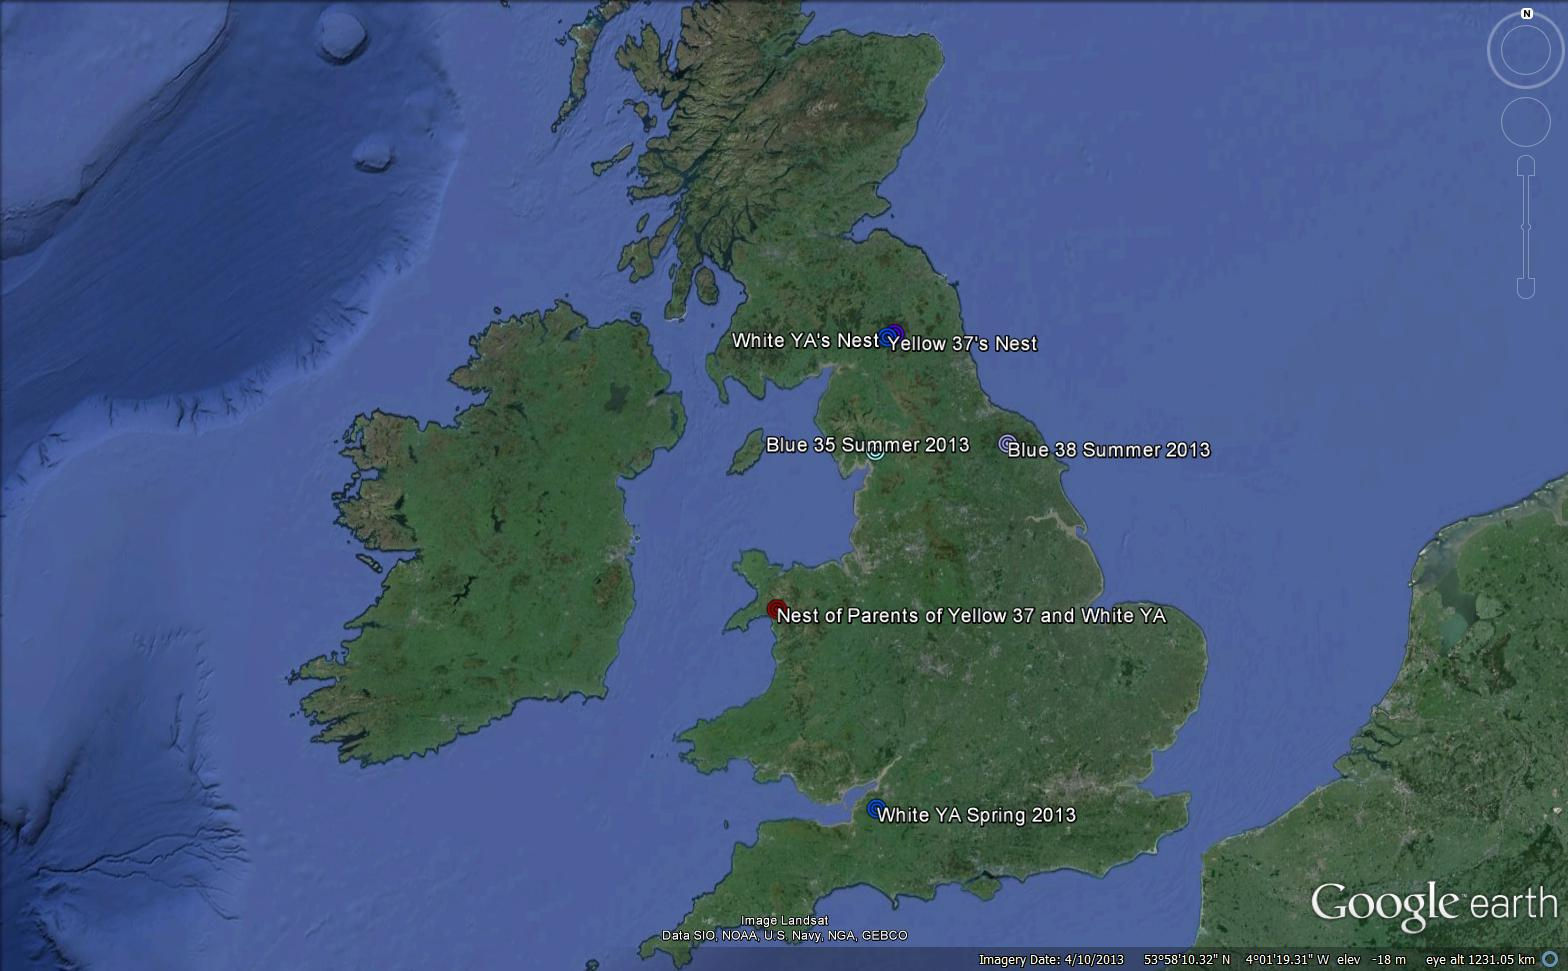 Maps and migration   Kielder Ospreys Google Earth Maps on google maps street view world, google maps street view location, google maps france, google maps update 2013, google maps 2014,